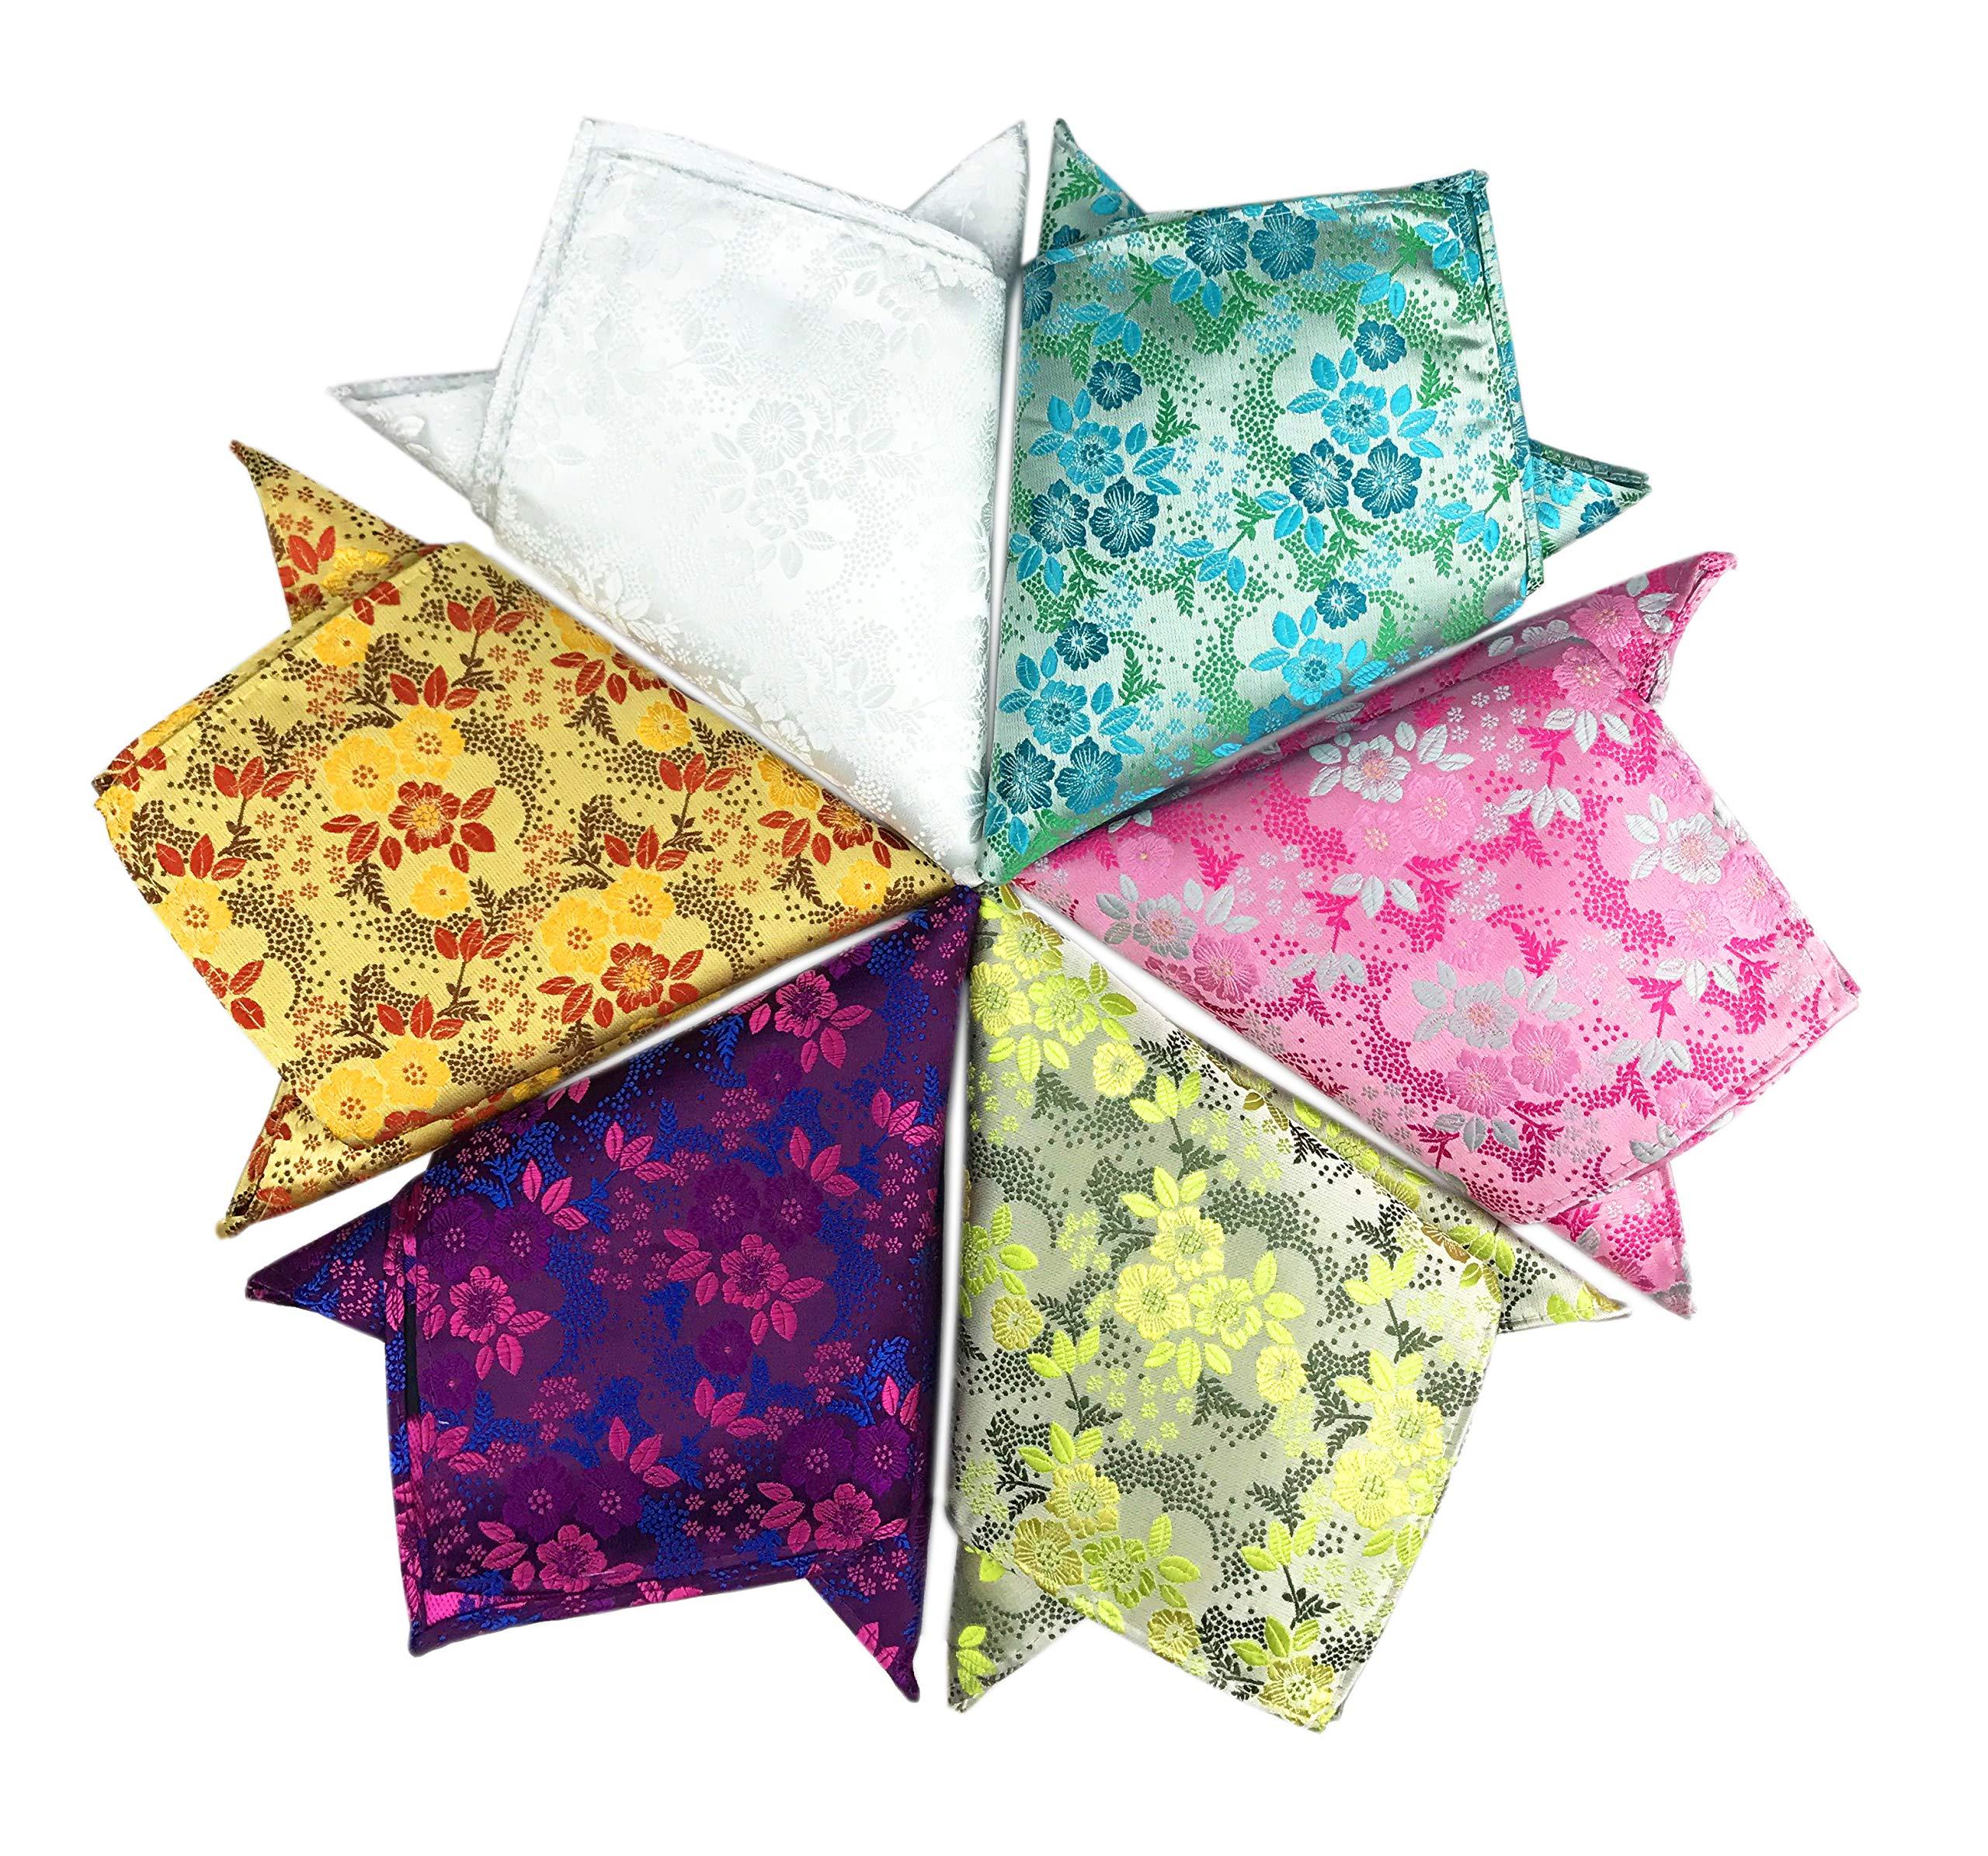 Pocket Squares for Men 6 Pack Mens Floral Handkerchiefs Set Assorted Mixed Colors 10x10 inch